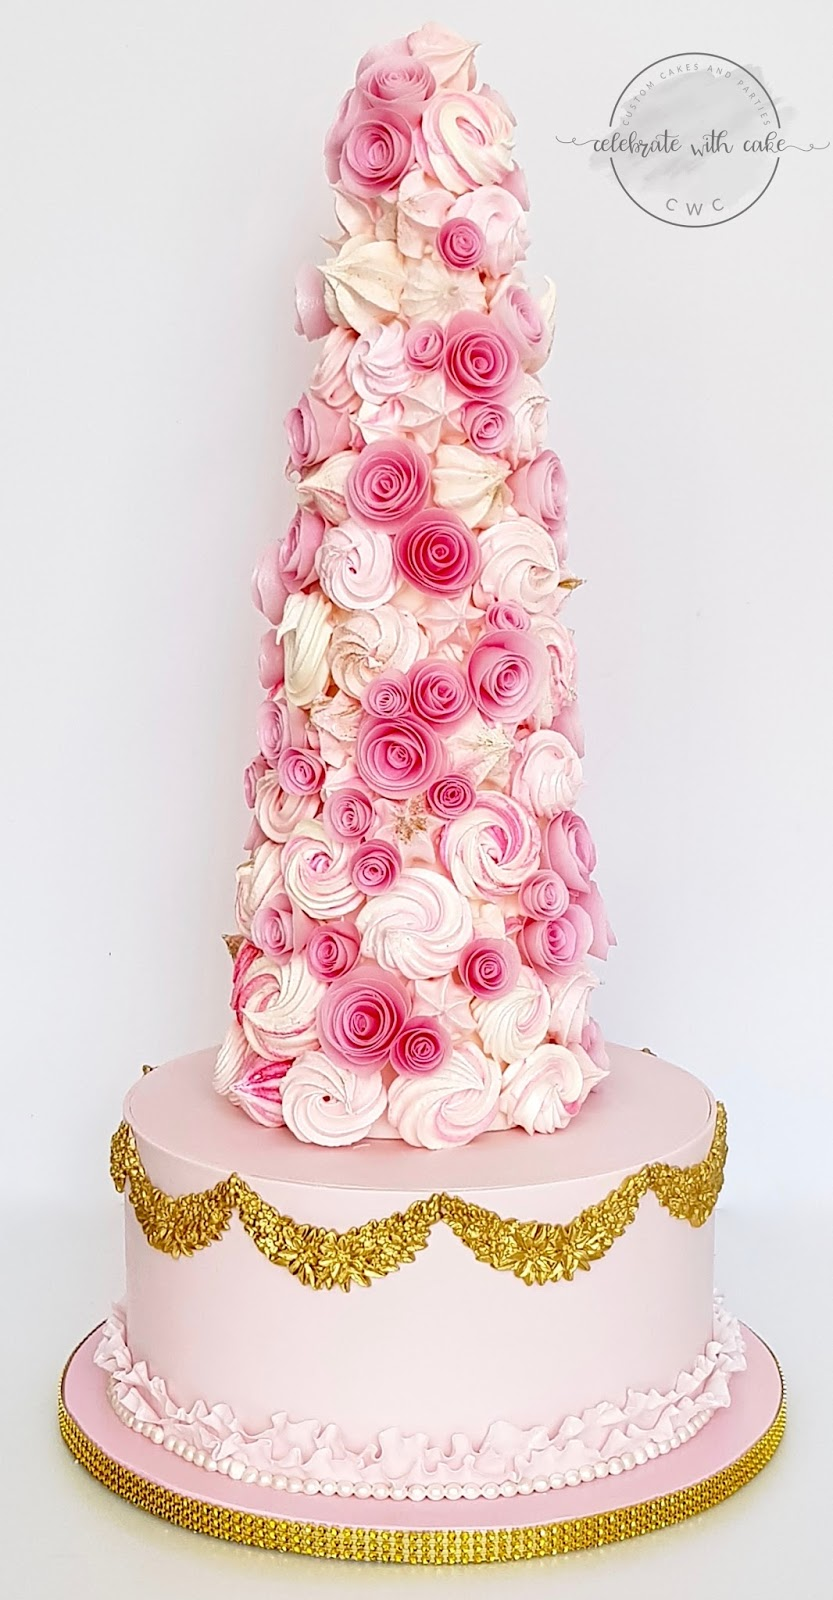 Celebrate with Cake!: Meringue Tower!